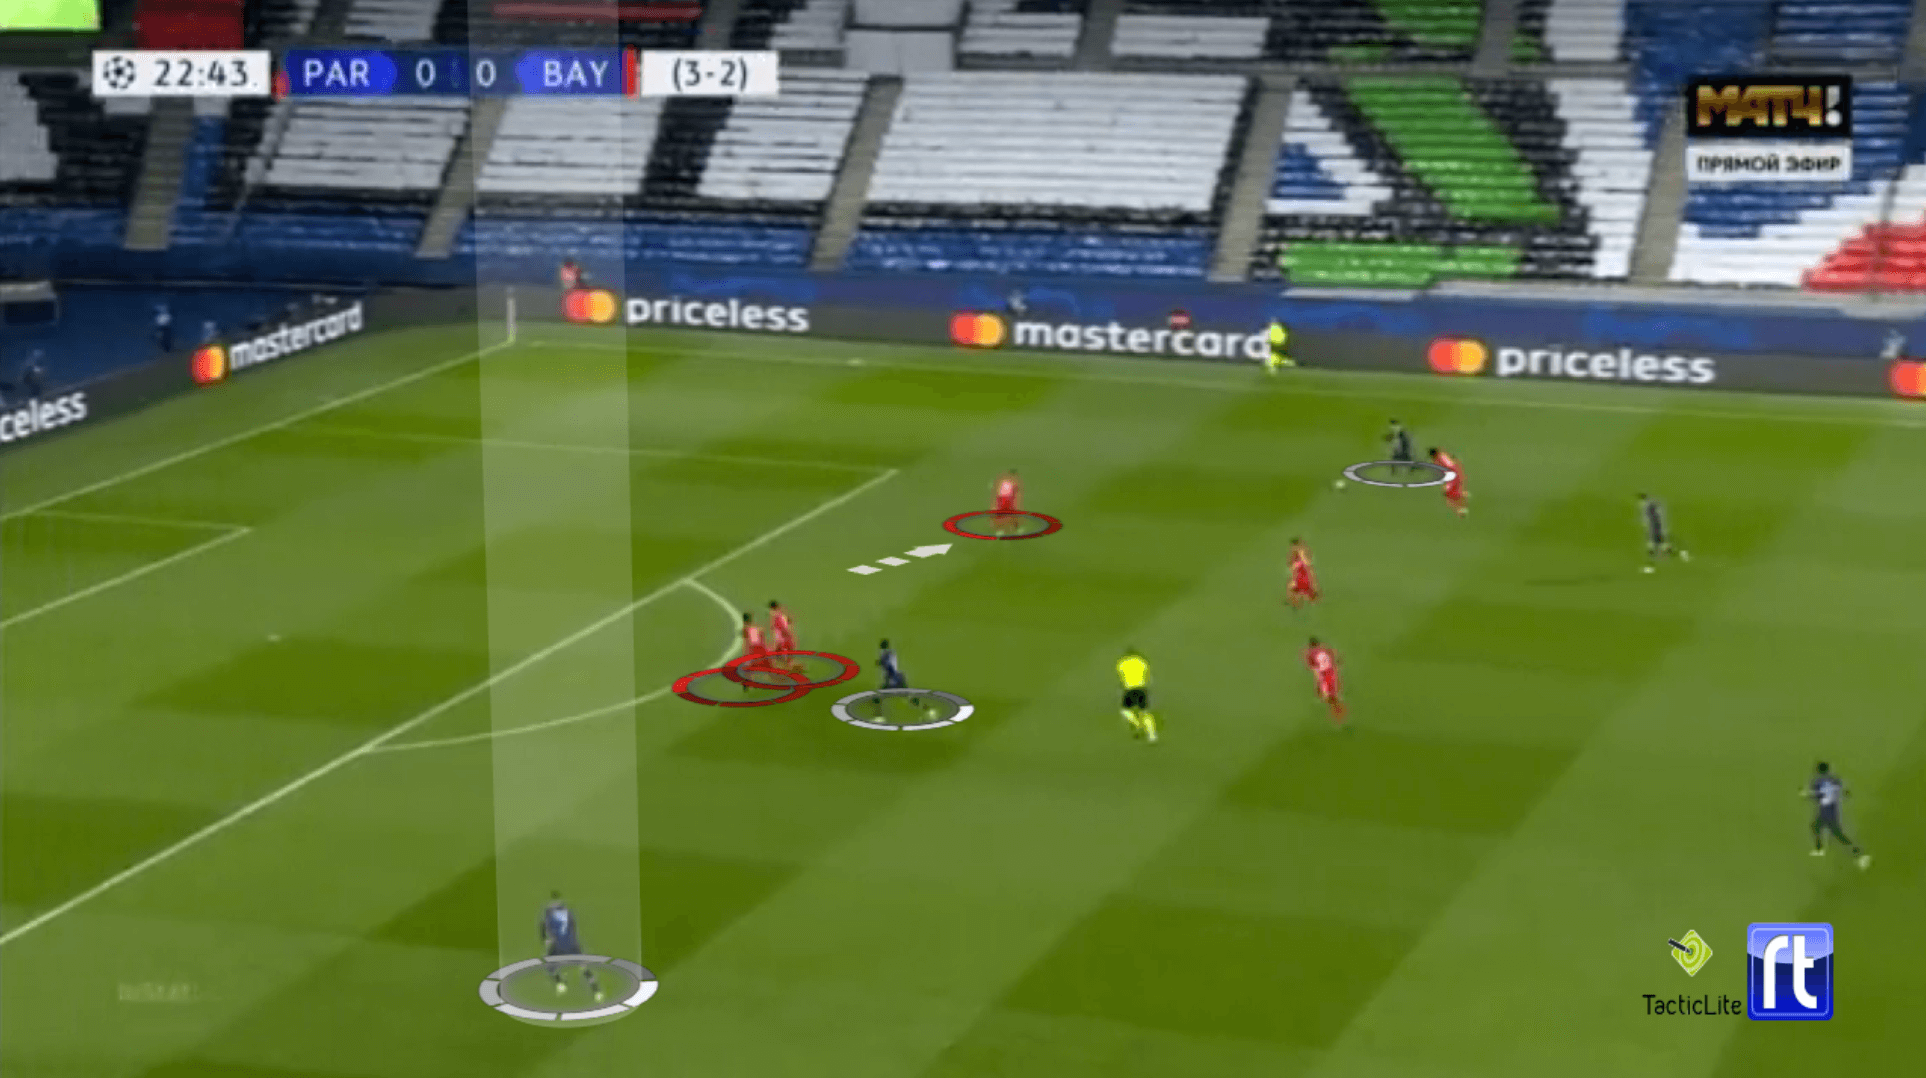 UEFA Champions League 2020/21: PSG vs Bayern Munich - tactical analysis tactics